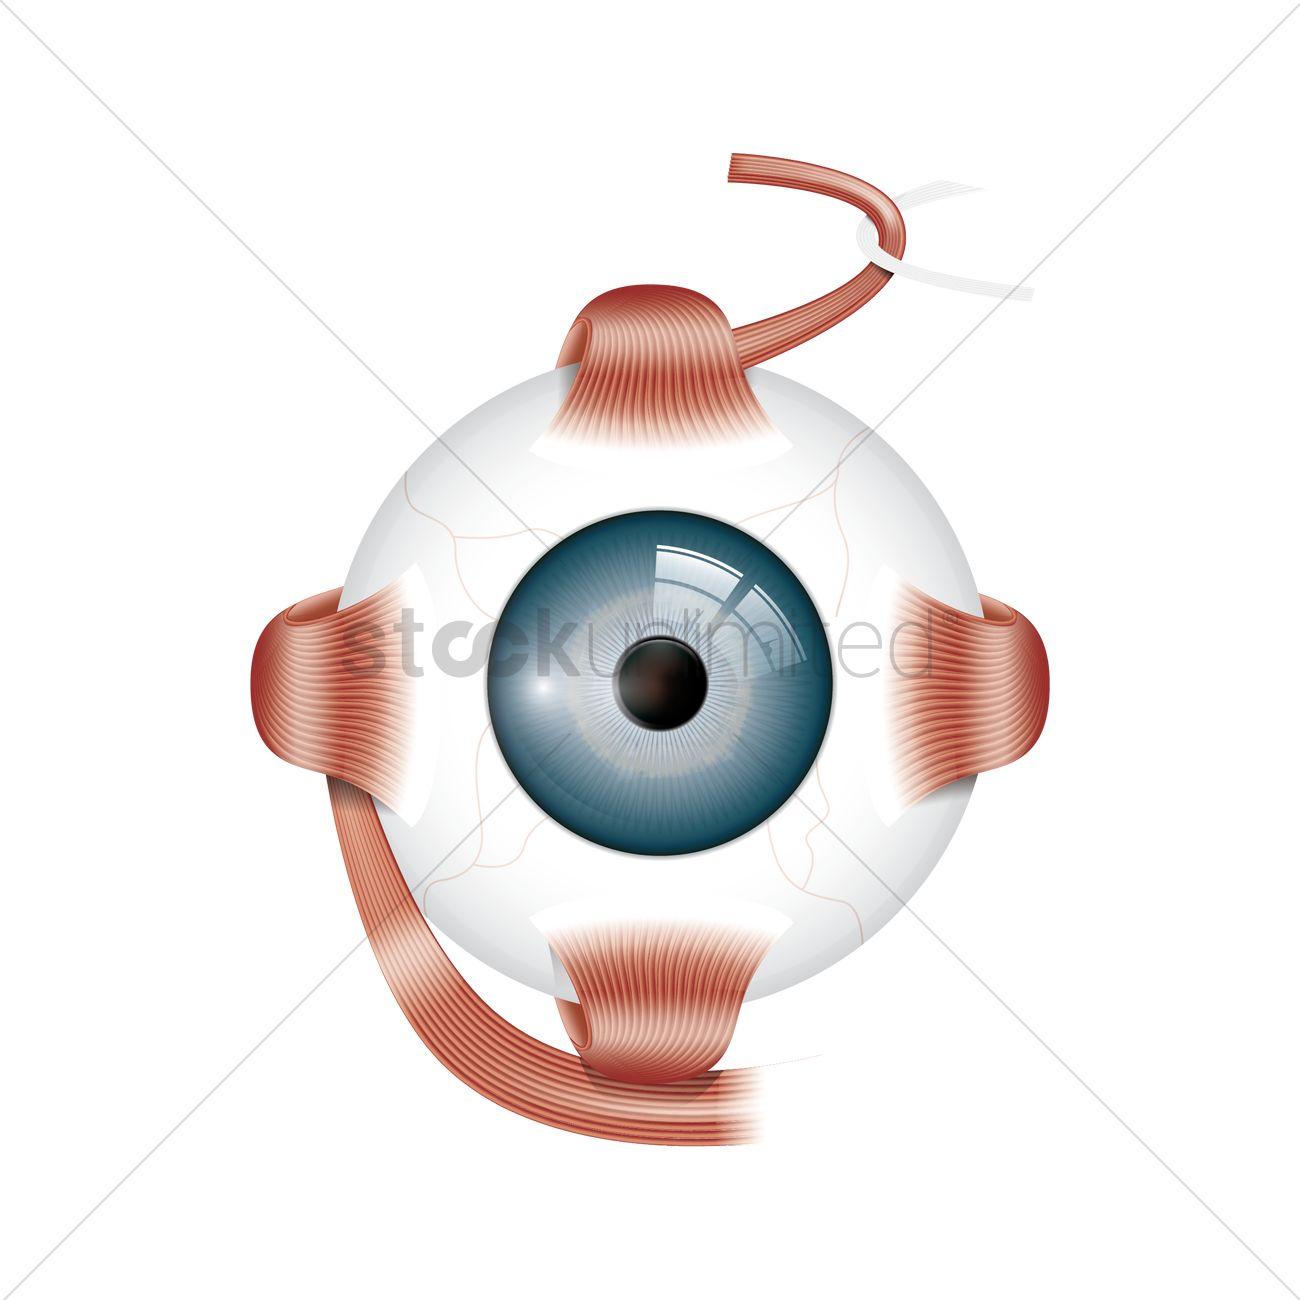 hight resolution of human eye anatomy vector graphic